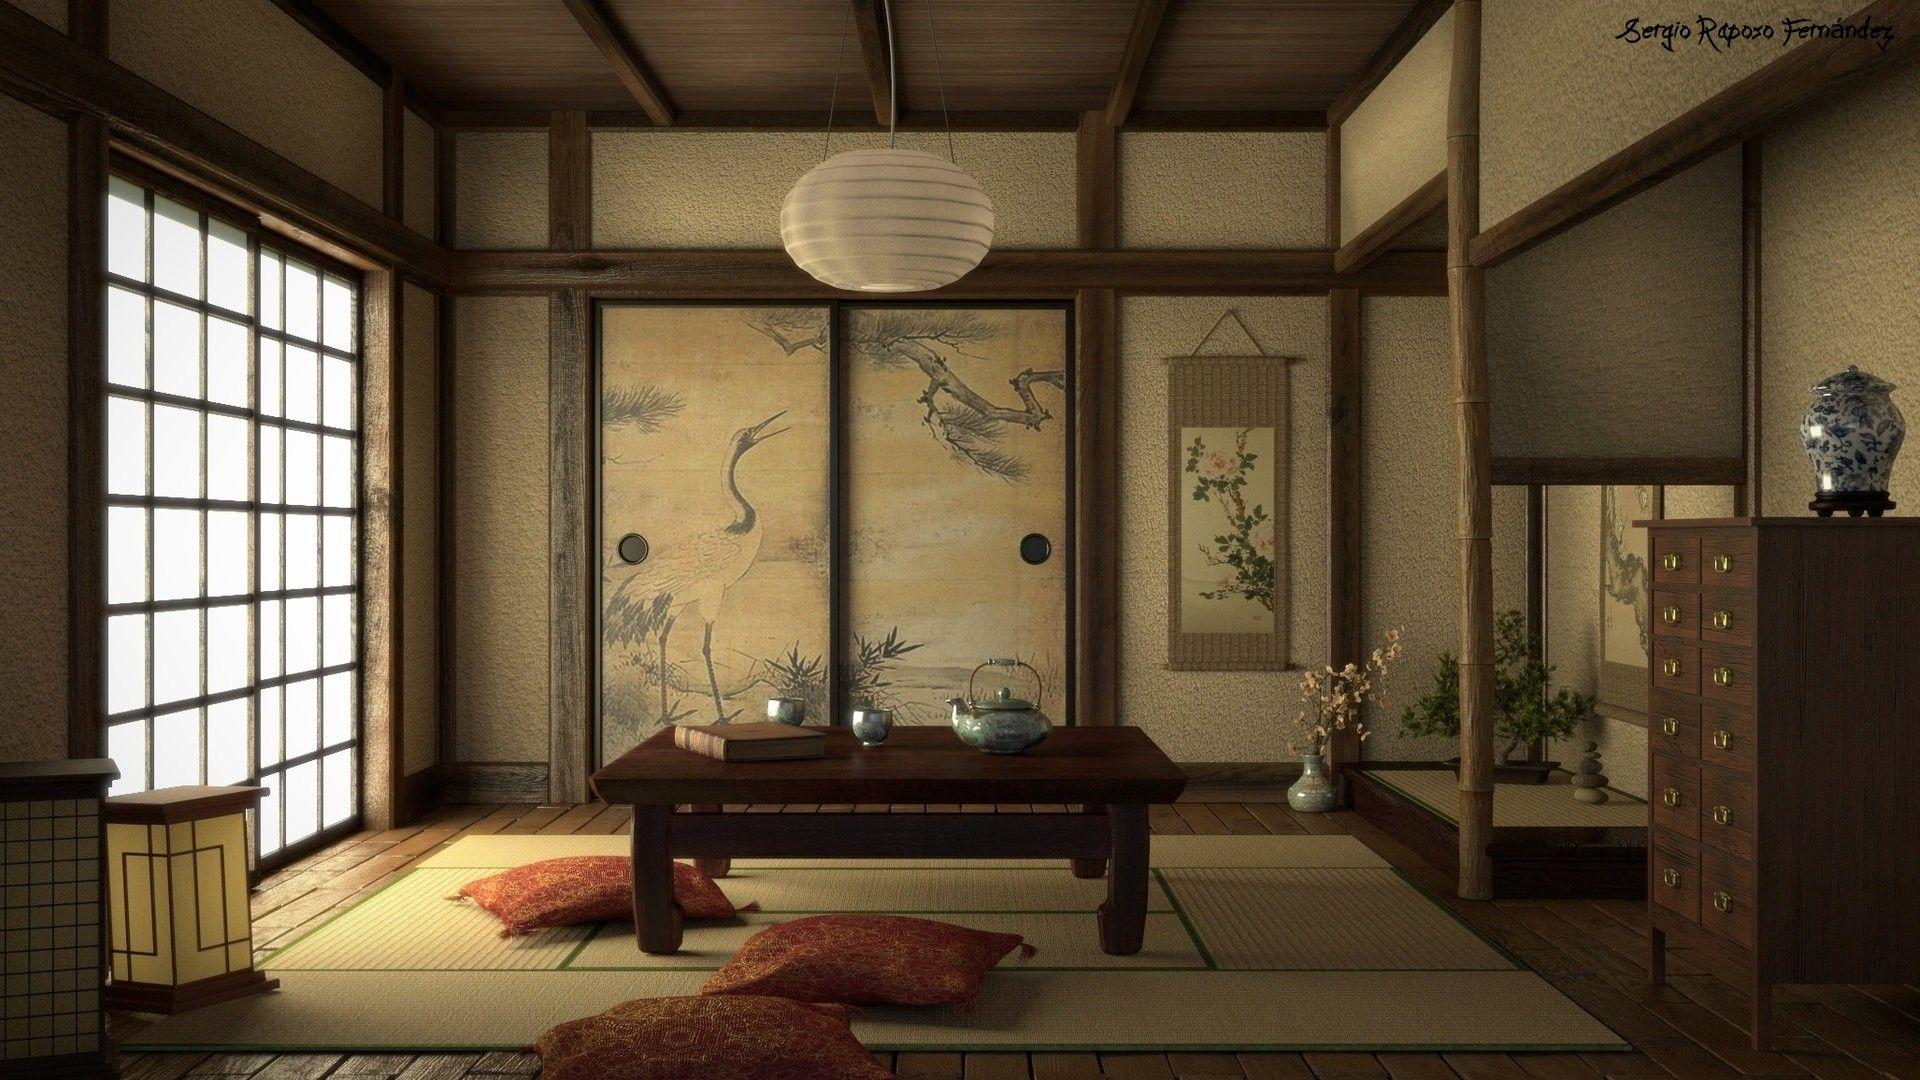 pin by elahe on places to visit washitsu, japanese interiorwashitsu, cool artwork, concept art tutorial, japanese interior, blenders, environment concept